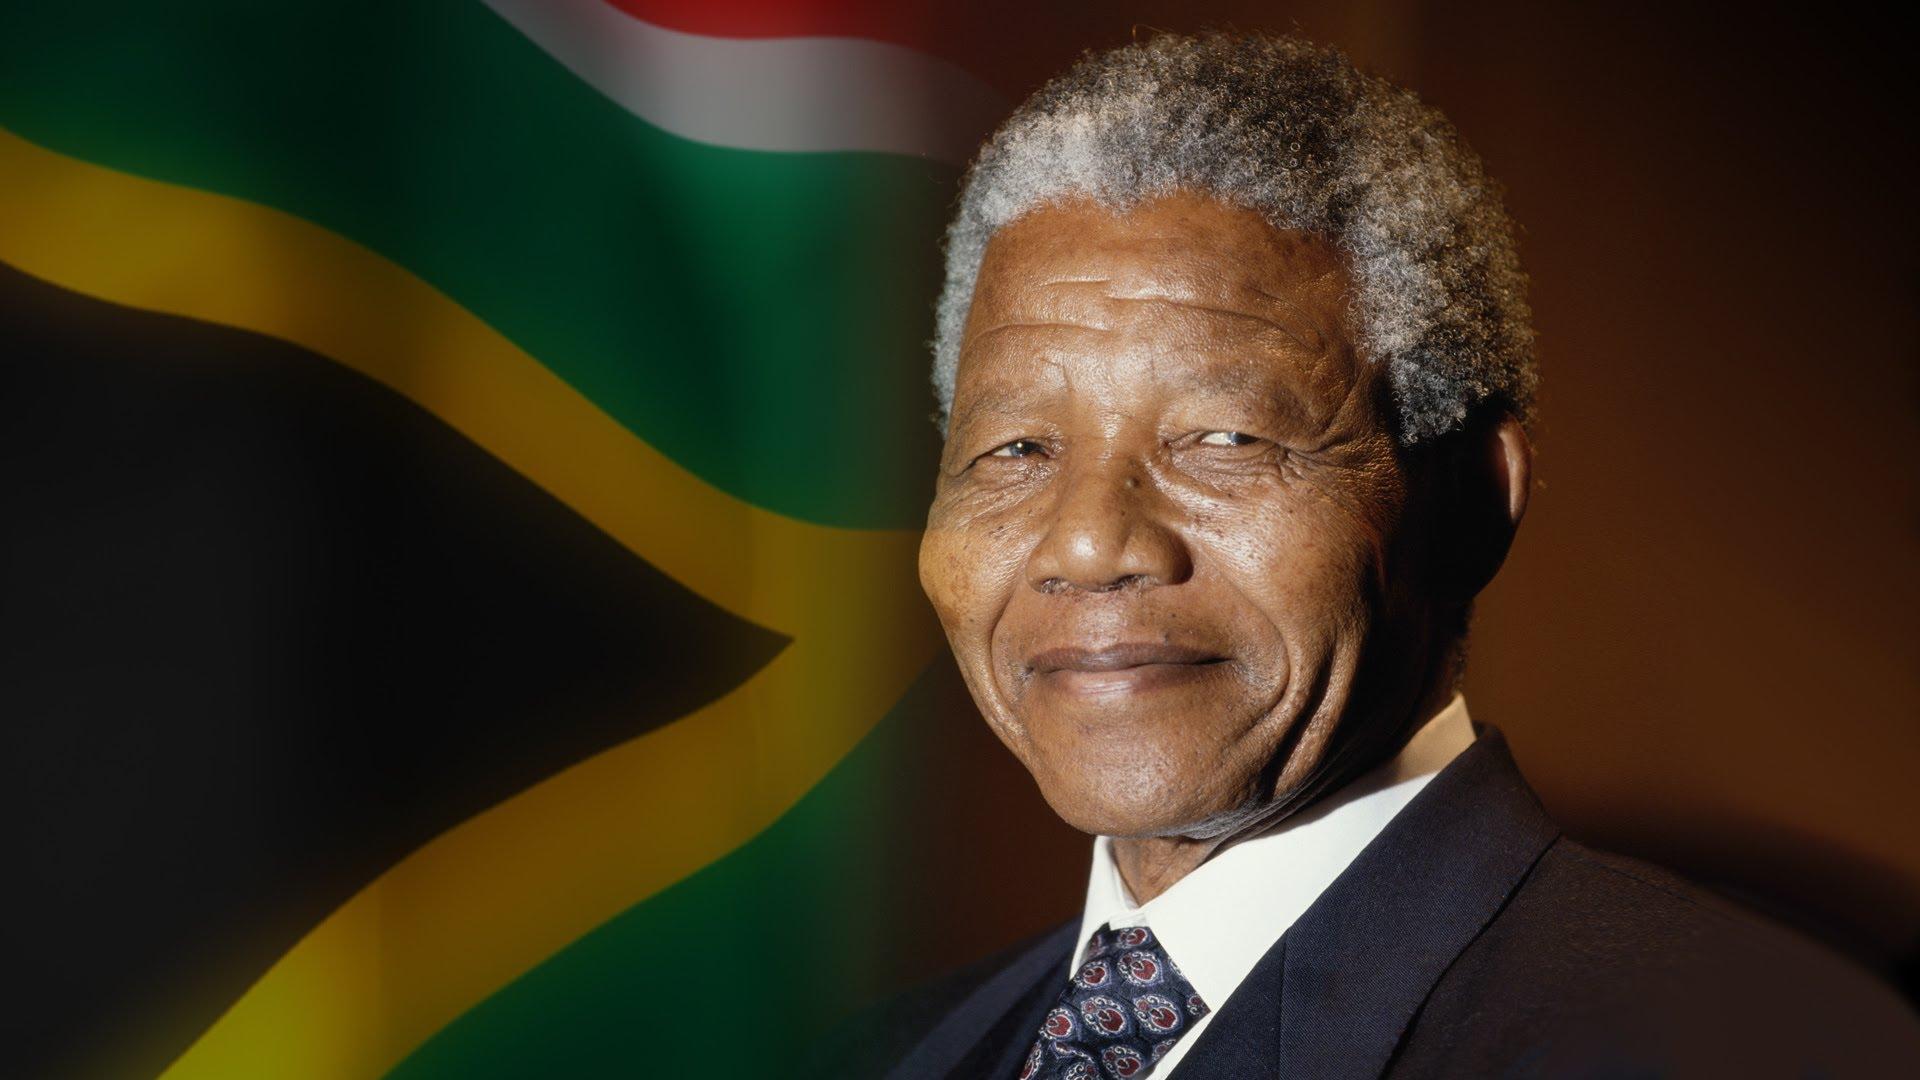 Anche Mandela lesse l'Antigone